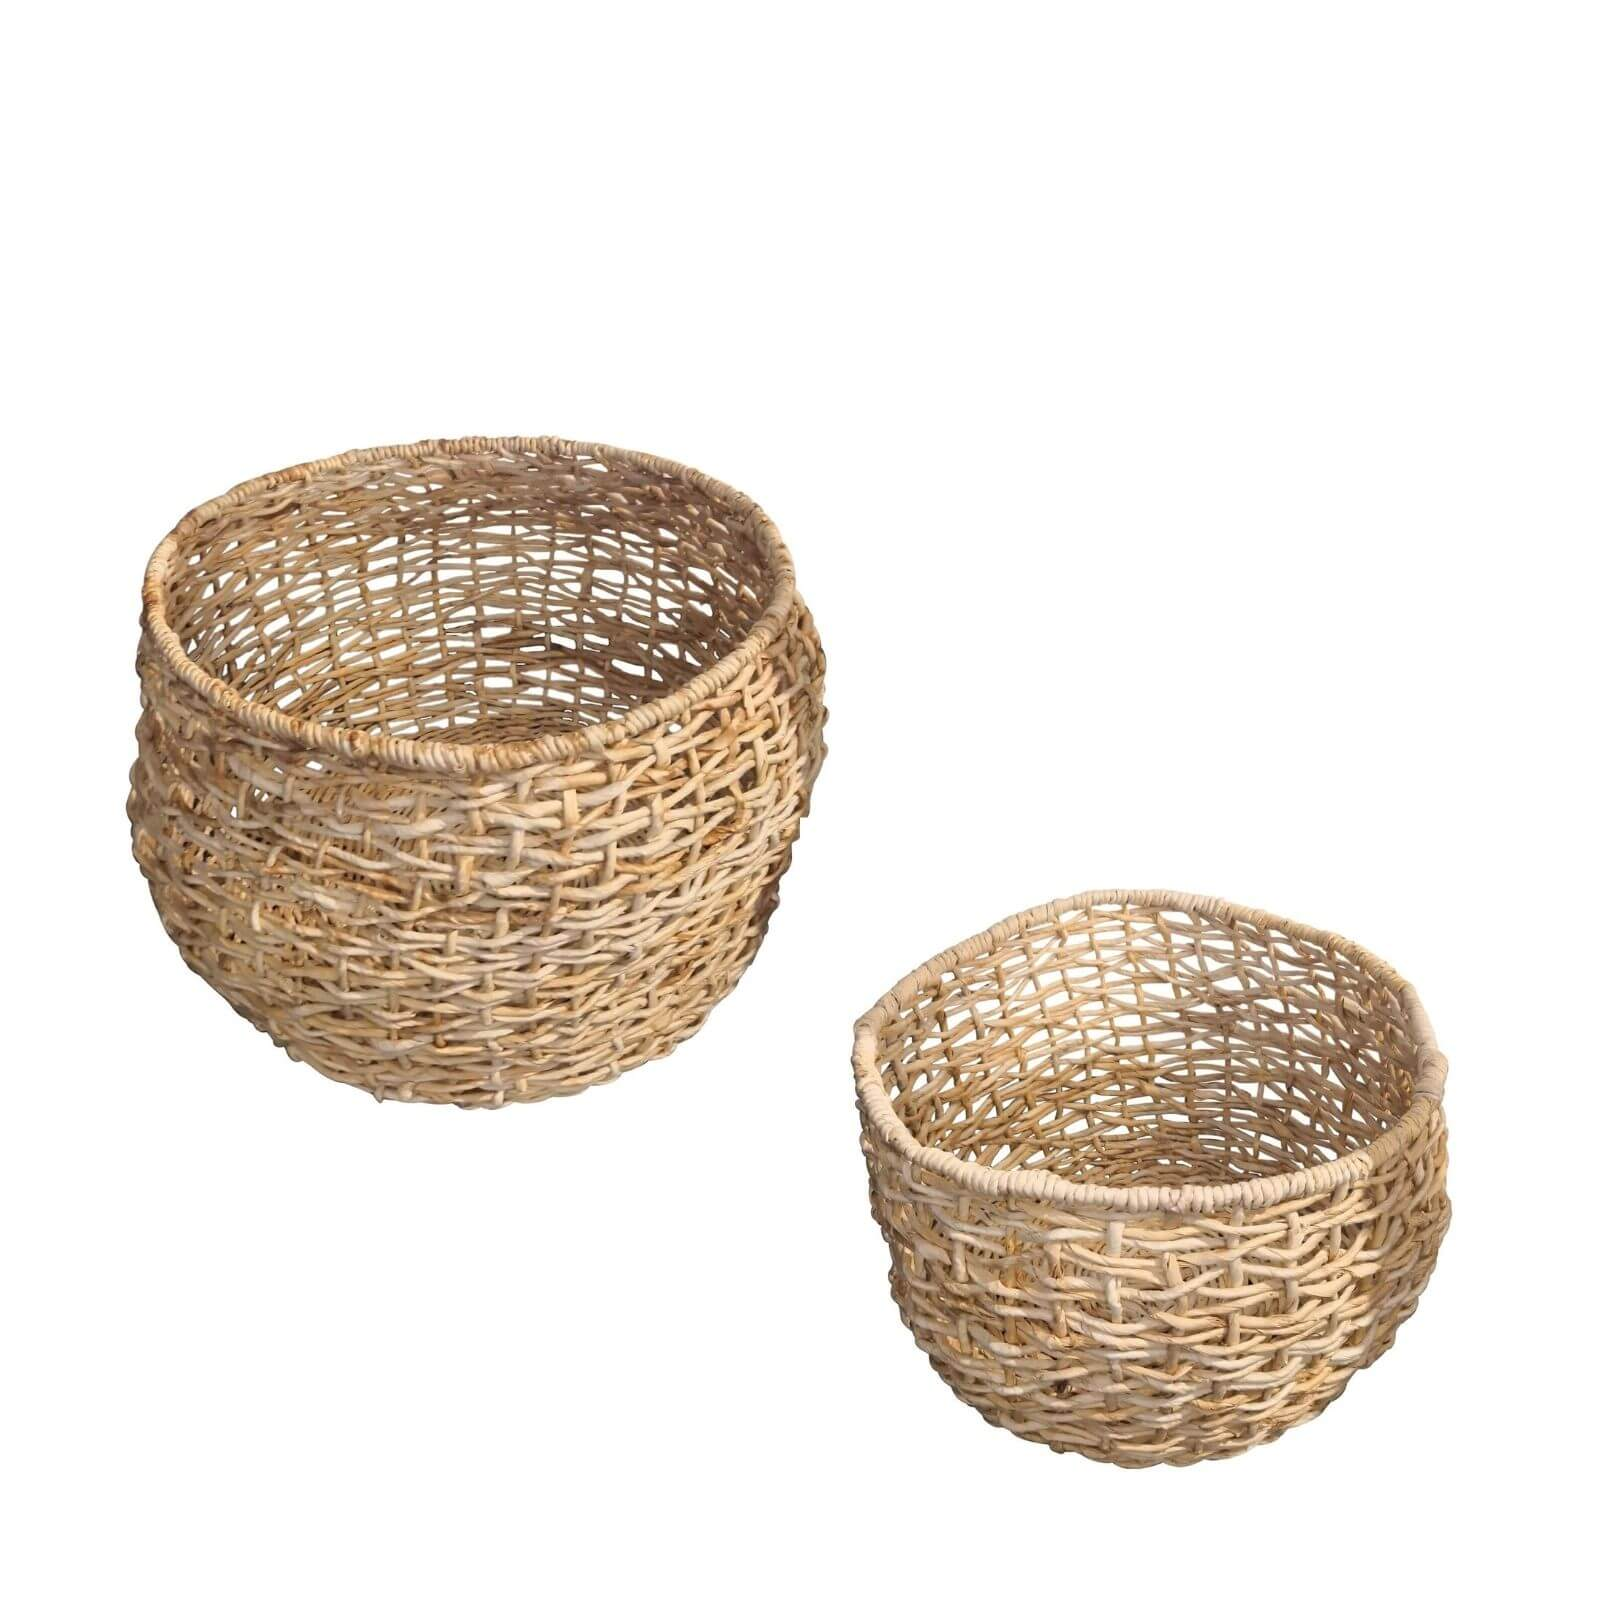 Papaya baskets set of 2